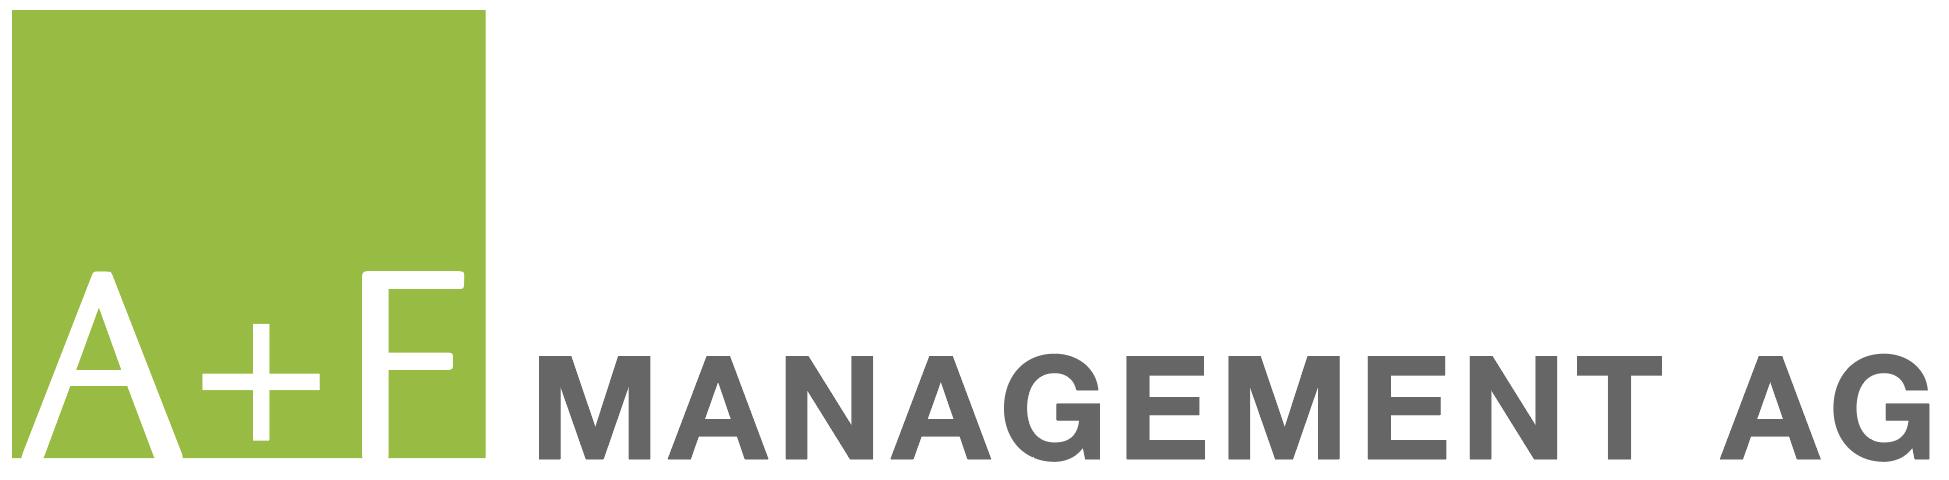 A+F Management